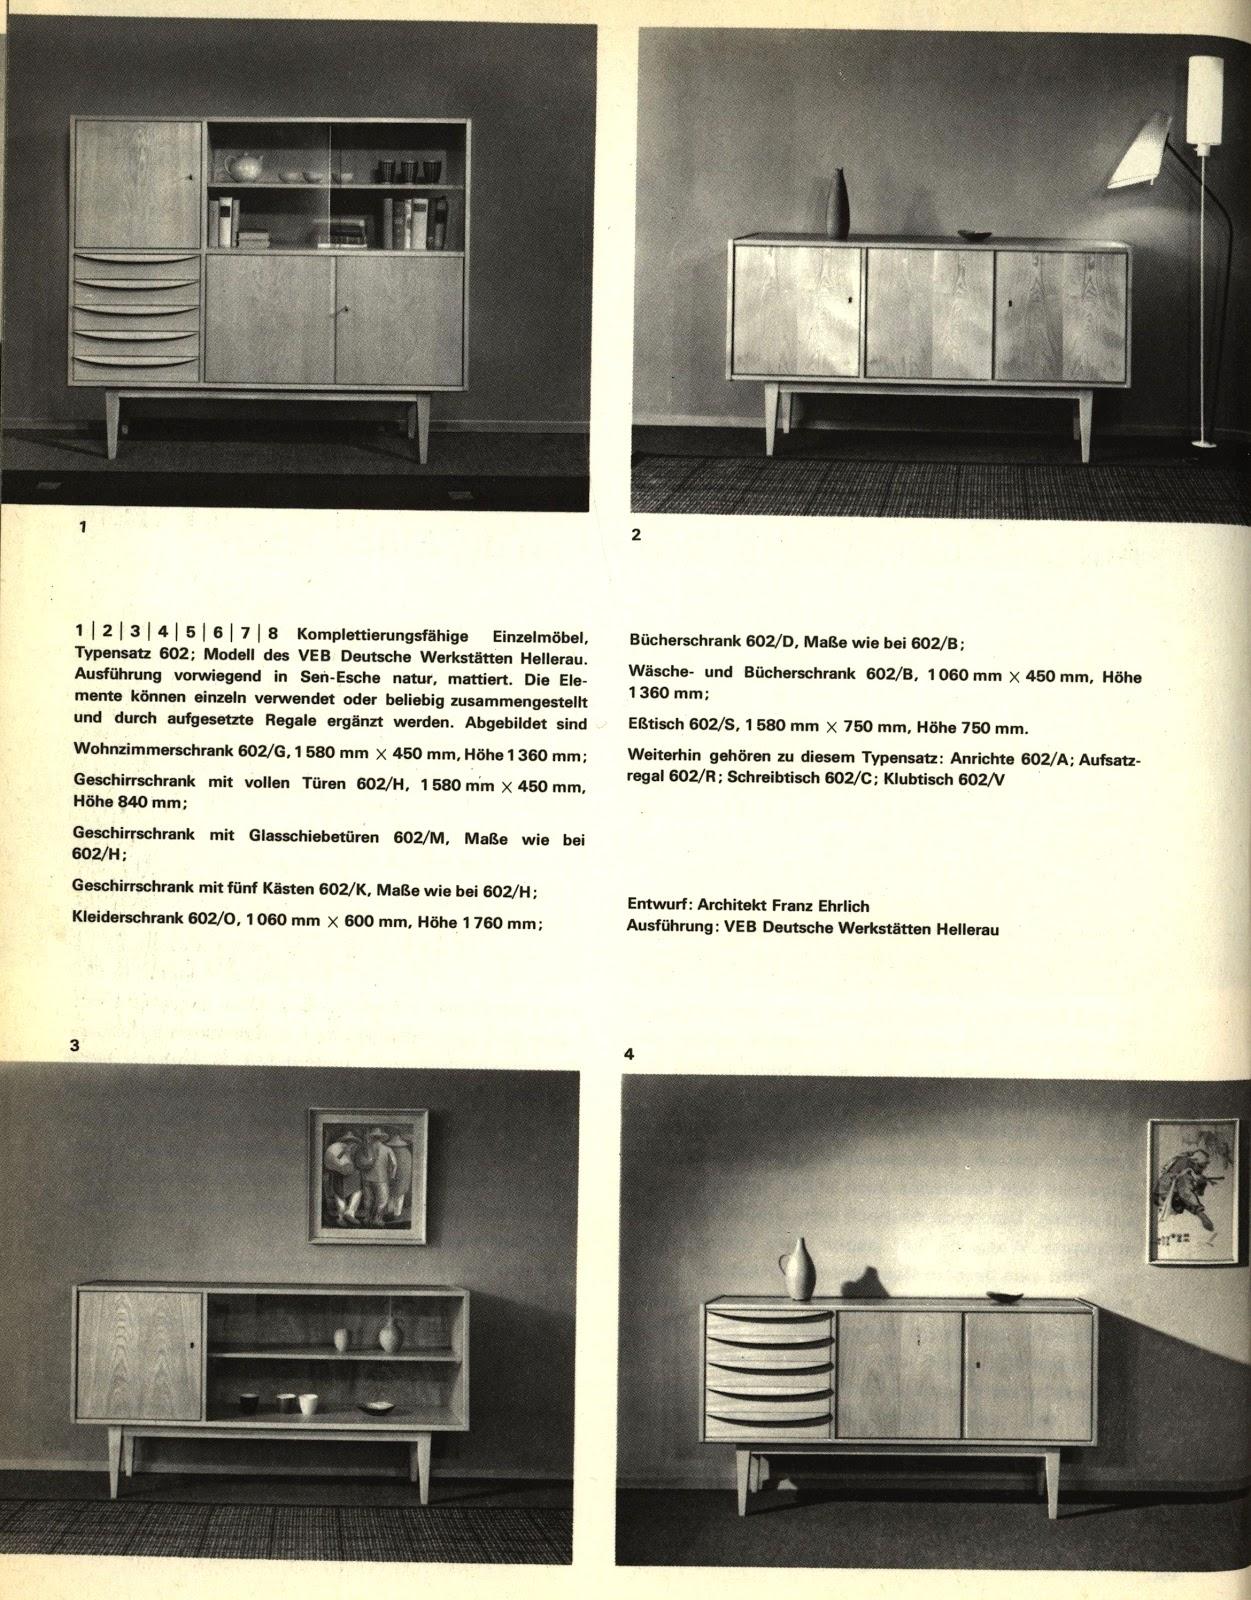 xxl m bel leipzig wohn design. Black Bedroom Furniture Sets. Home Design Ideas